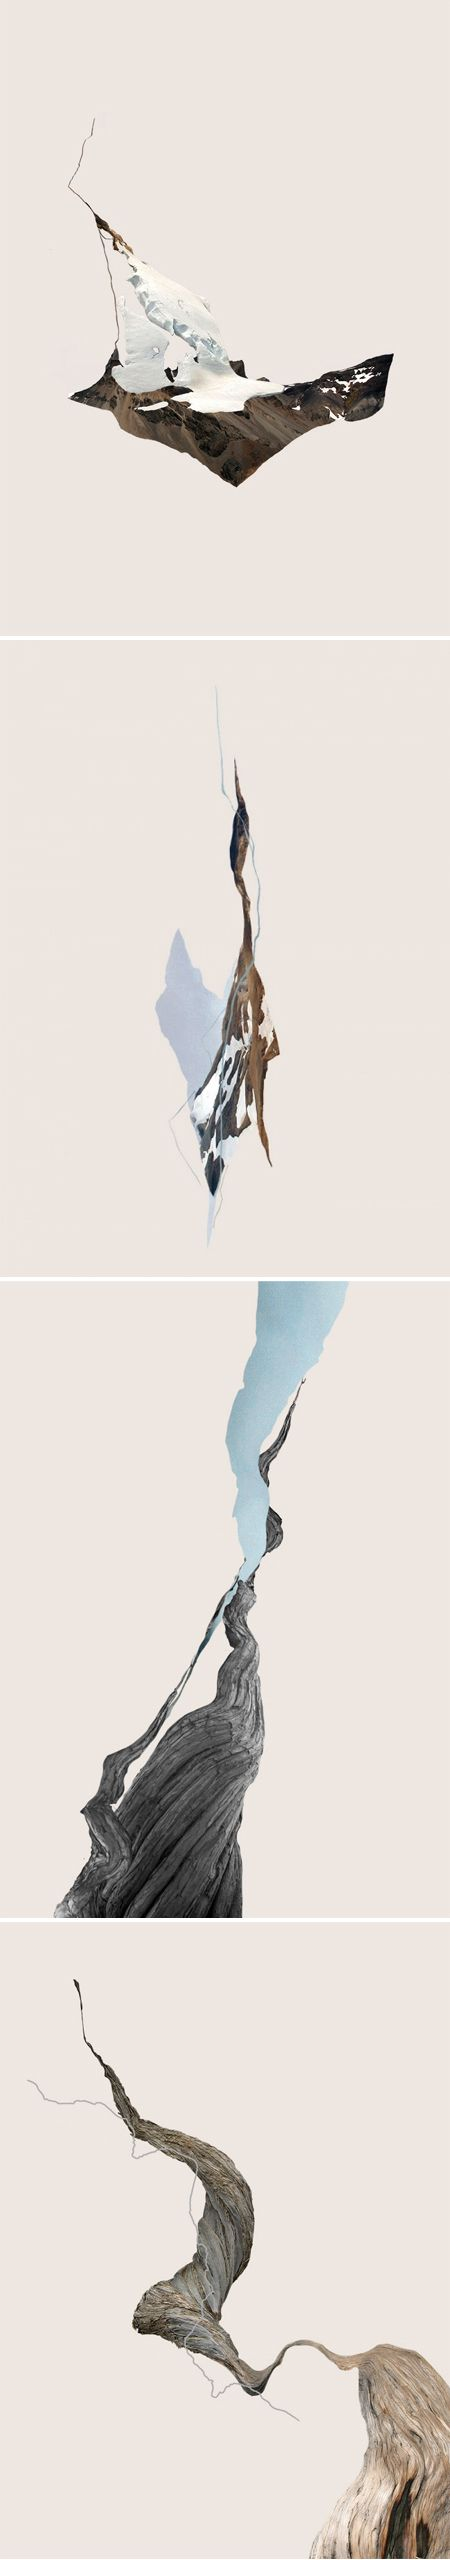 chris Thompson. Amazing texture design love this work.